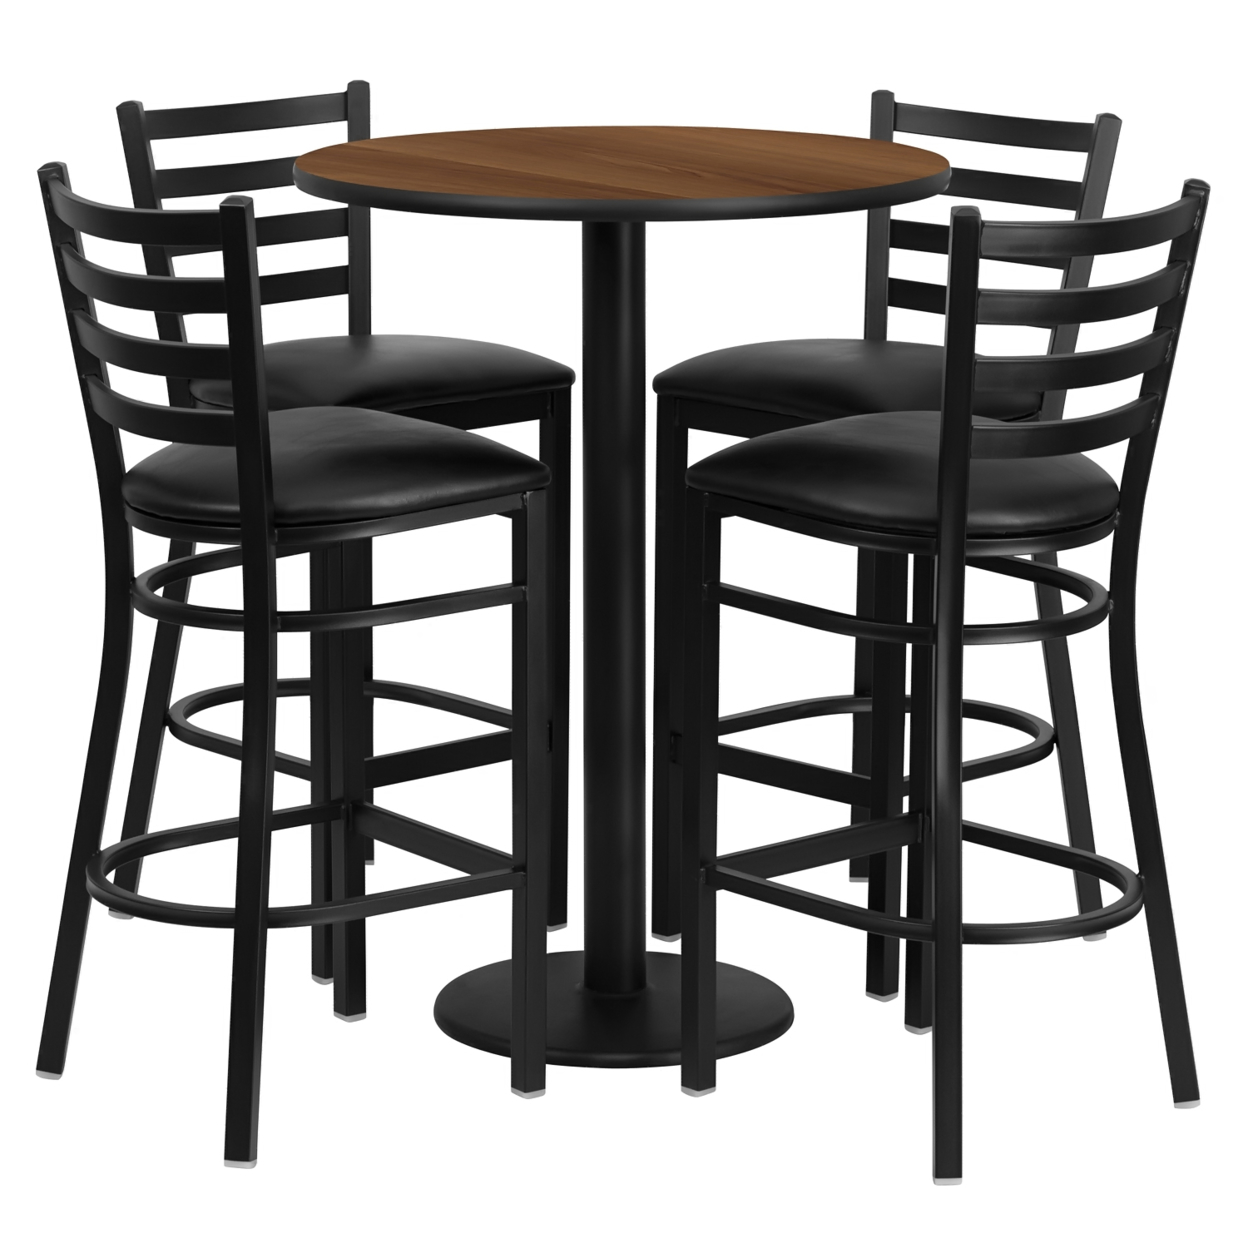 все цены на Flash Furniture 30'' Round Walnut Laminate Table Set with 4 Ladder Back Metal Bar Stools - Black Vinyl Seat [863-RSRB1024-GG]